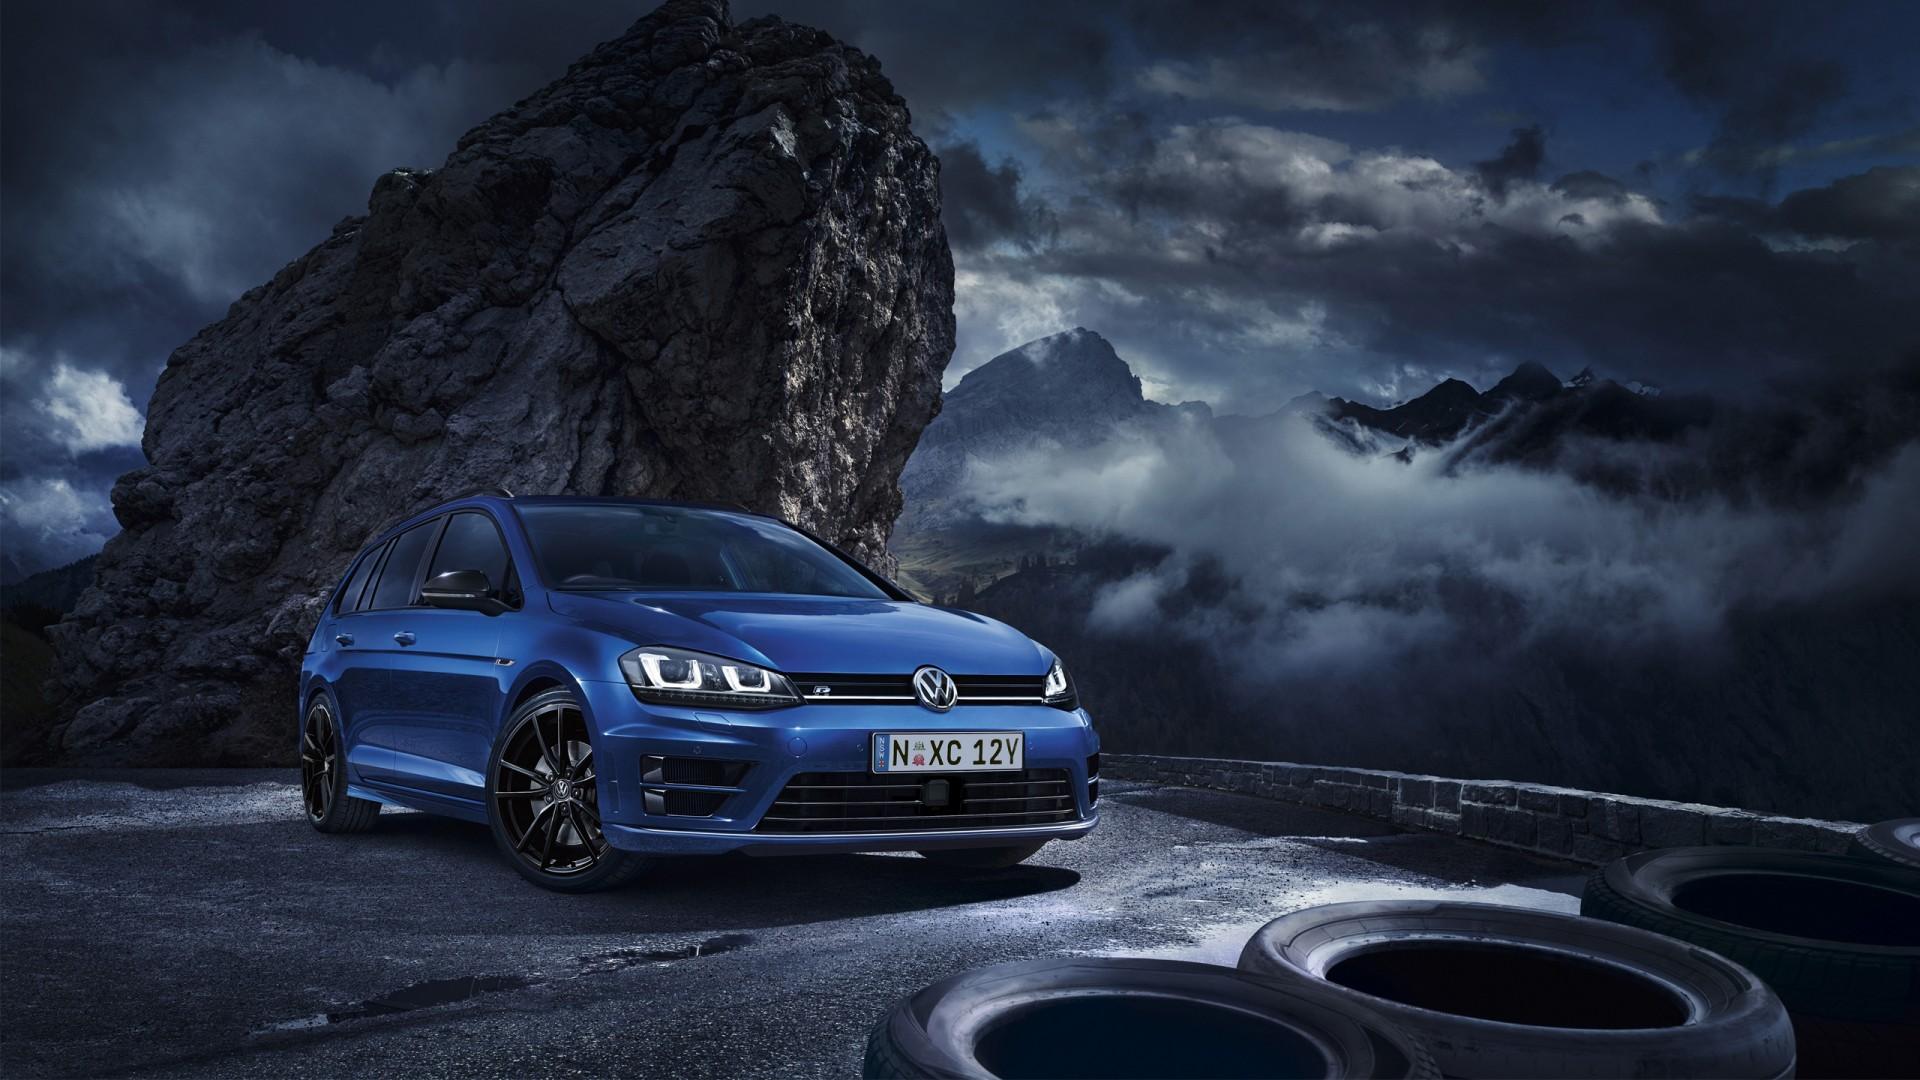 2015 Volkswagen Golf R Wagon Wallpaper | HD Car Wallpapers ...